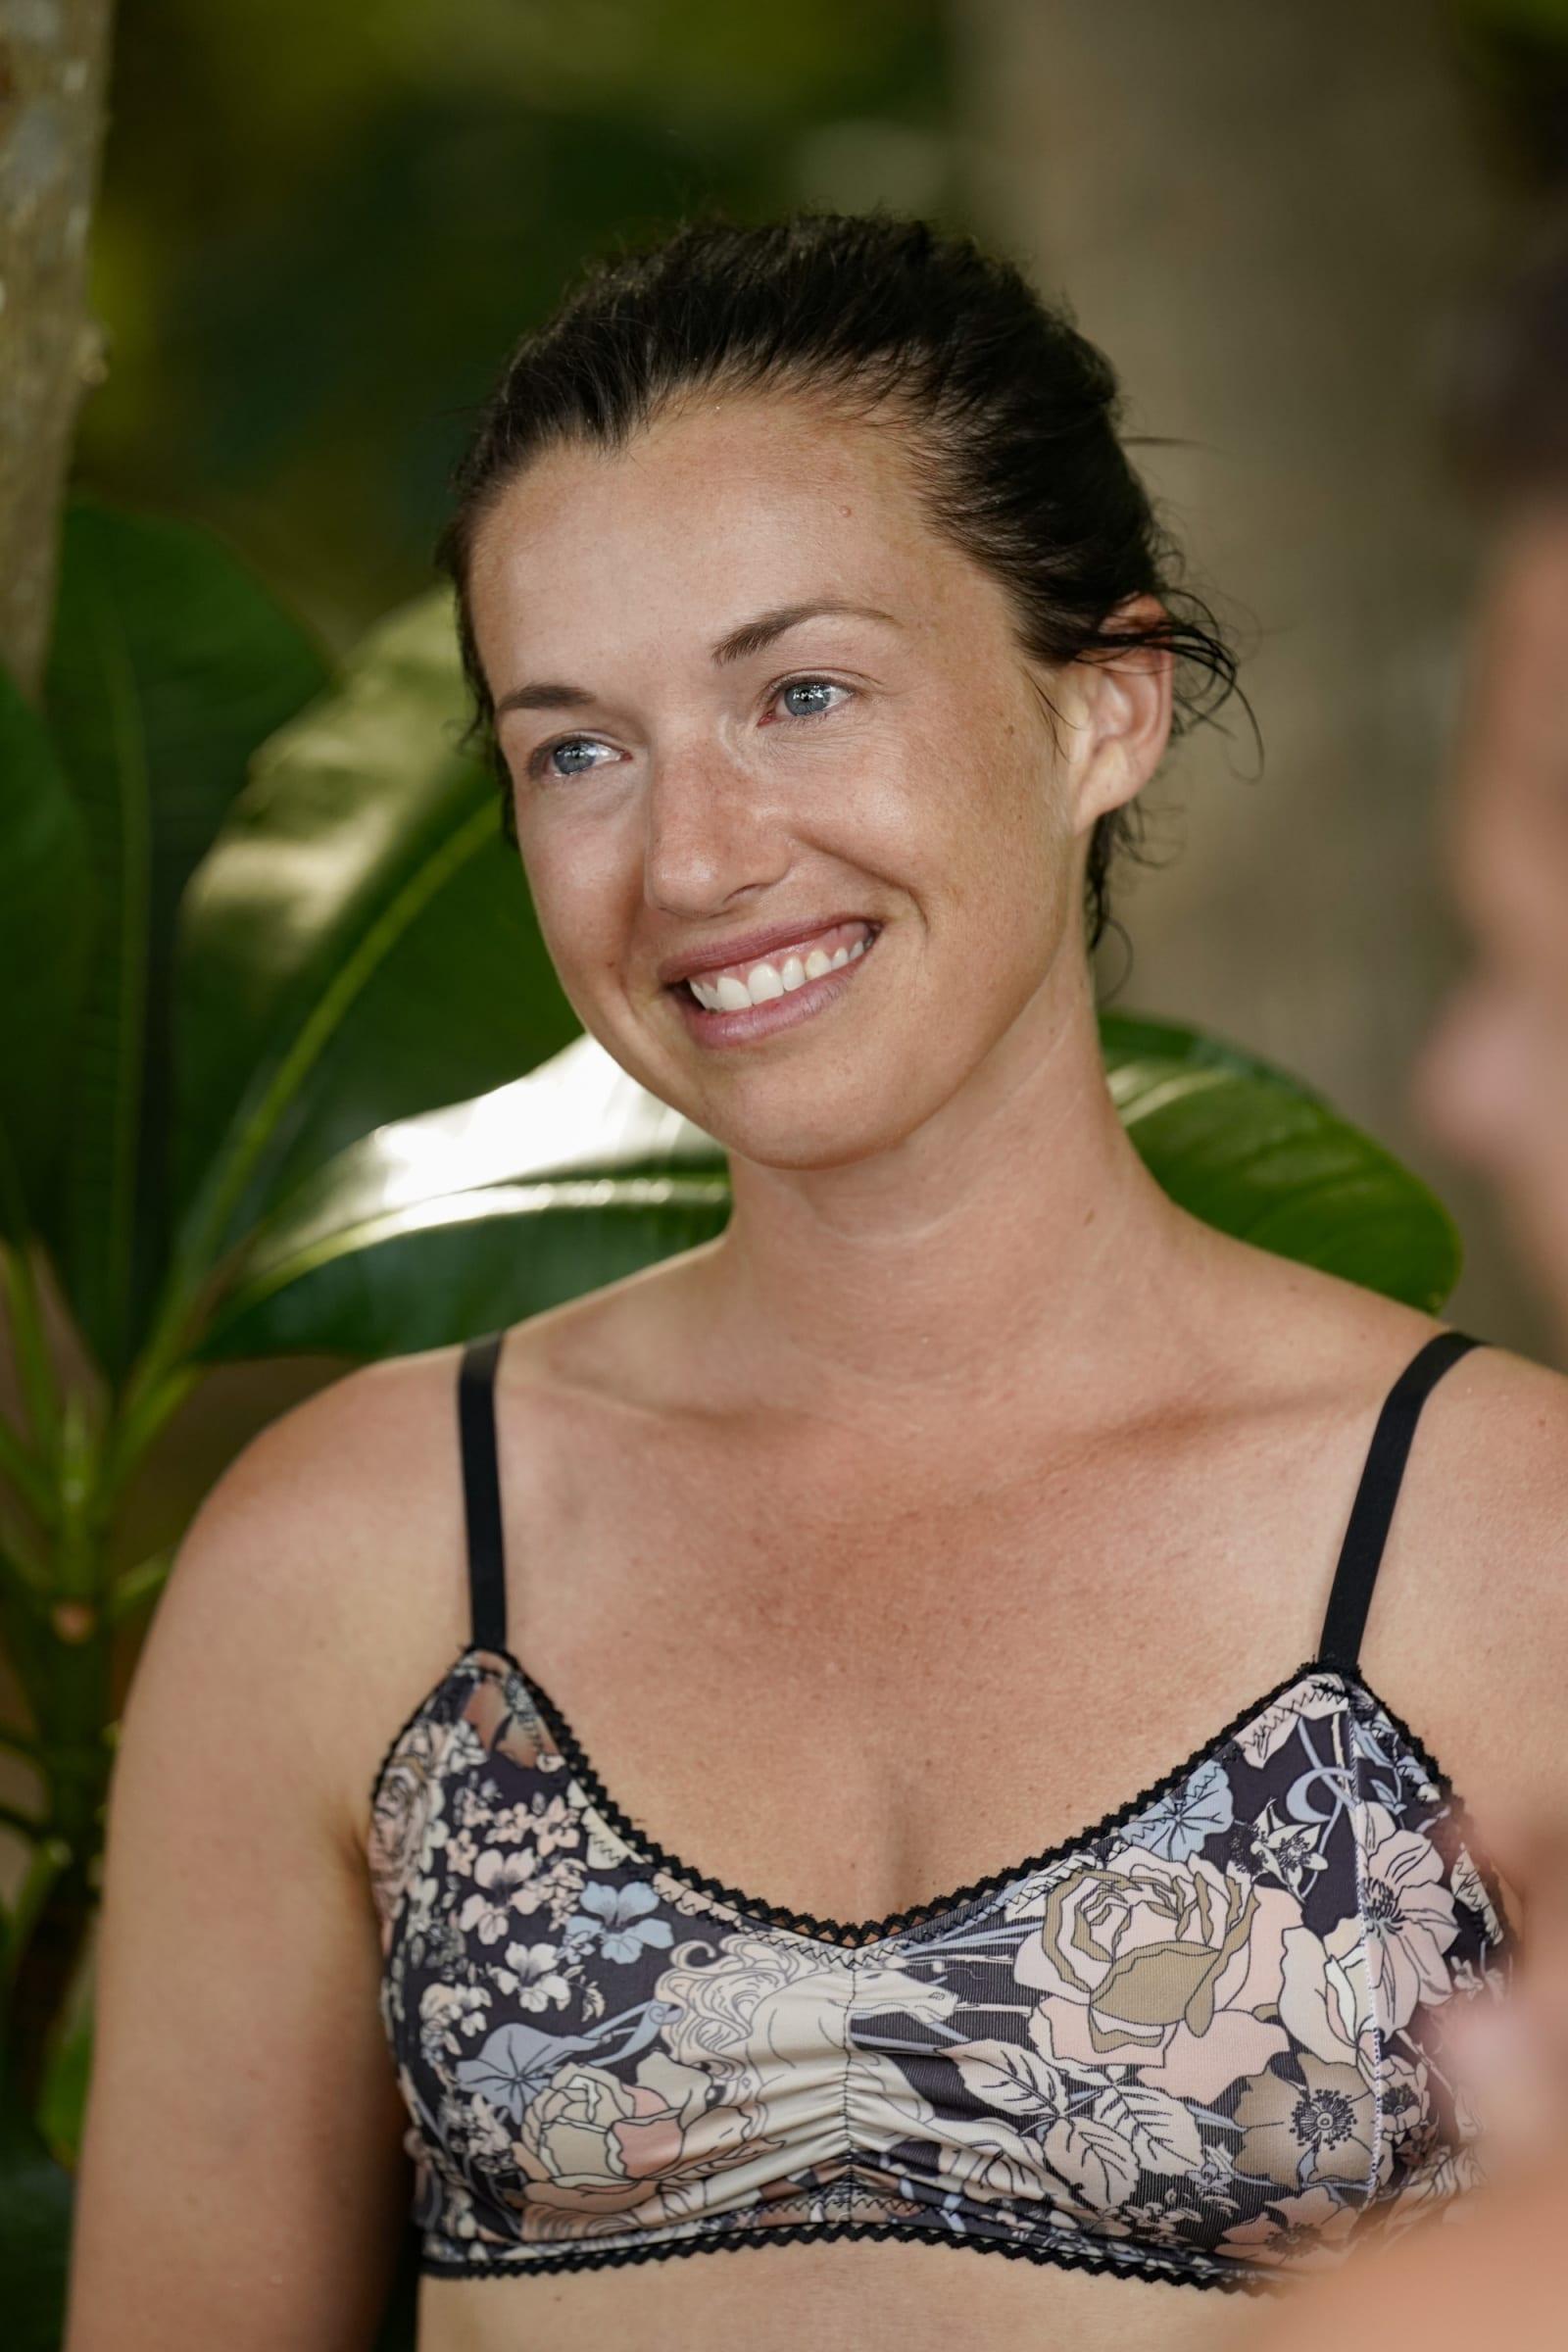 Parvati Shallow Survivor Winners at War episode 1